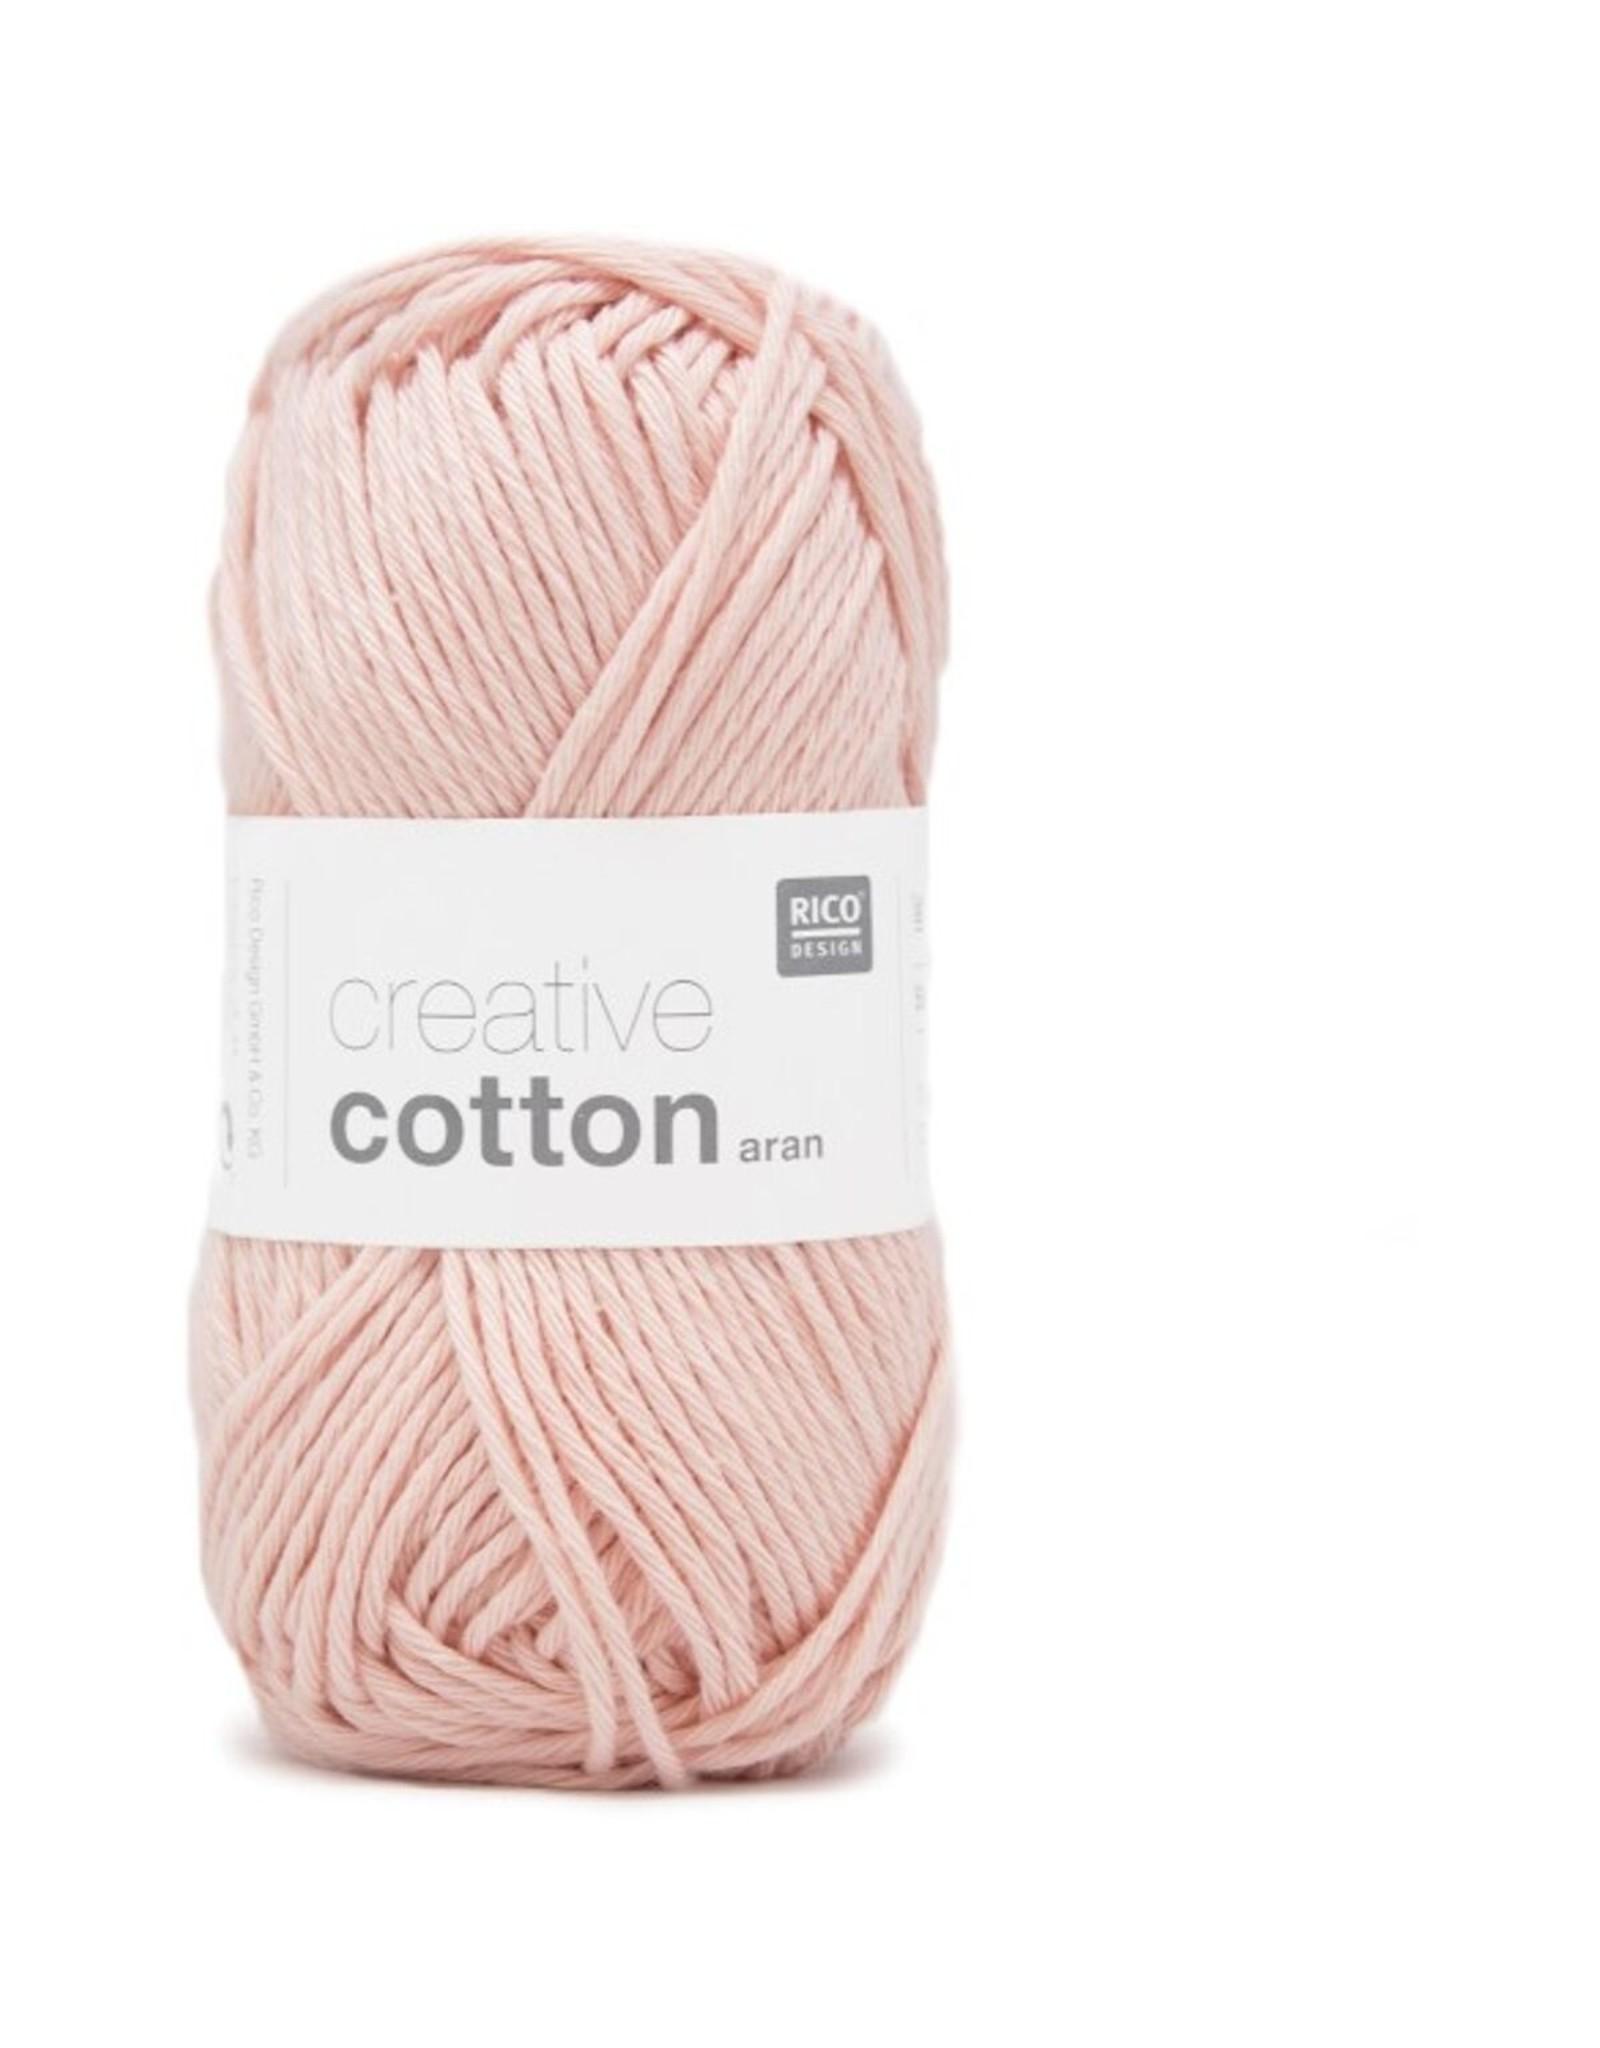 Rico Rico Creative Cotton Aran *